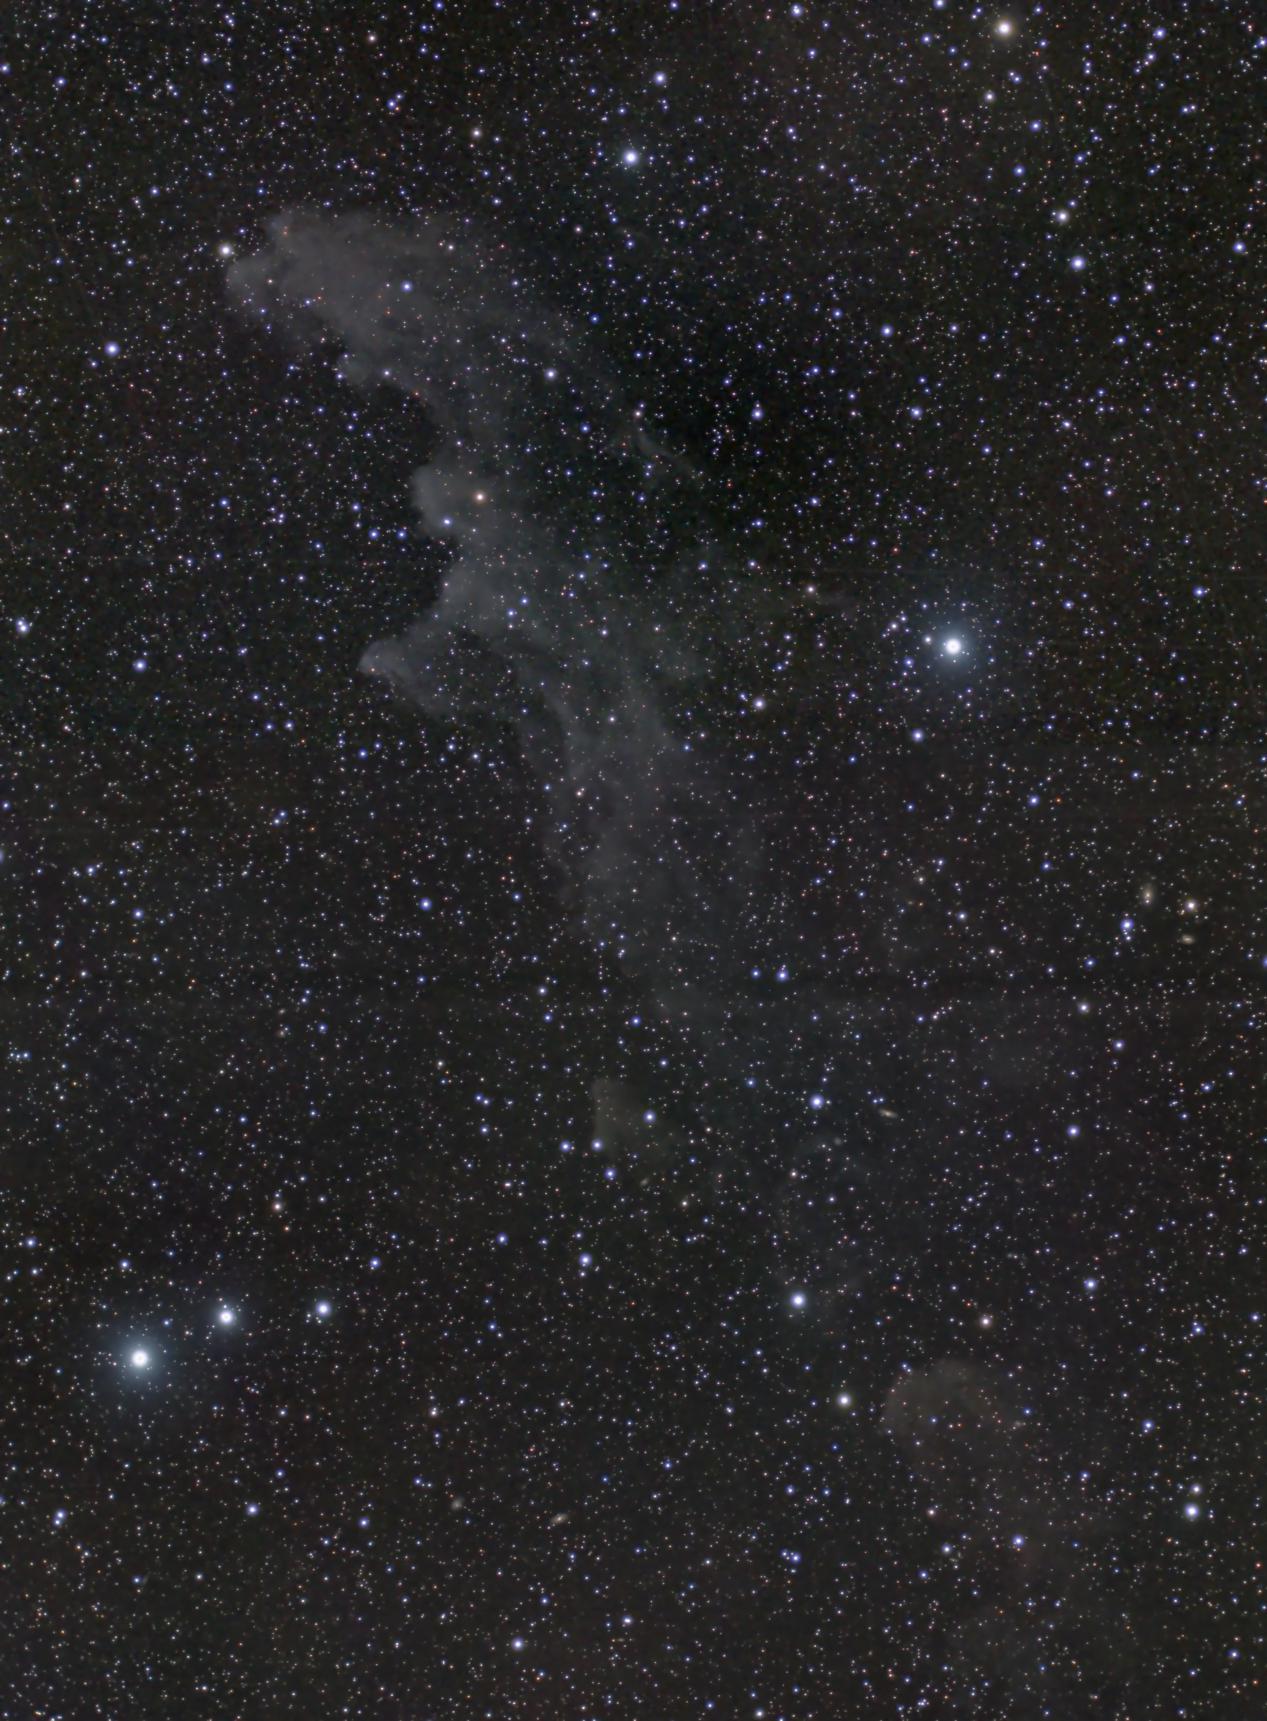 Witches Head nebula